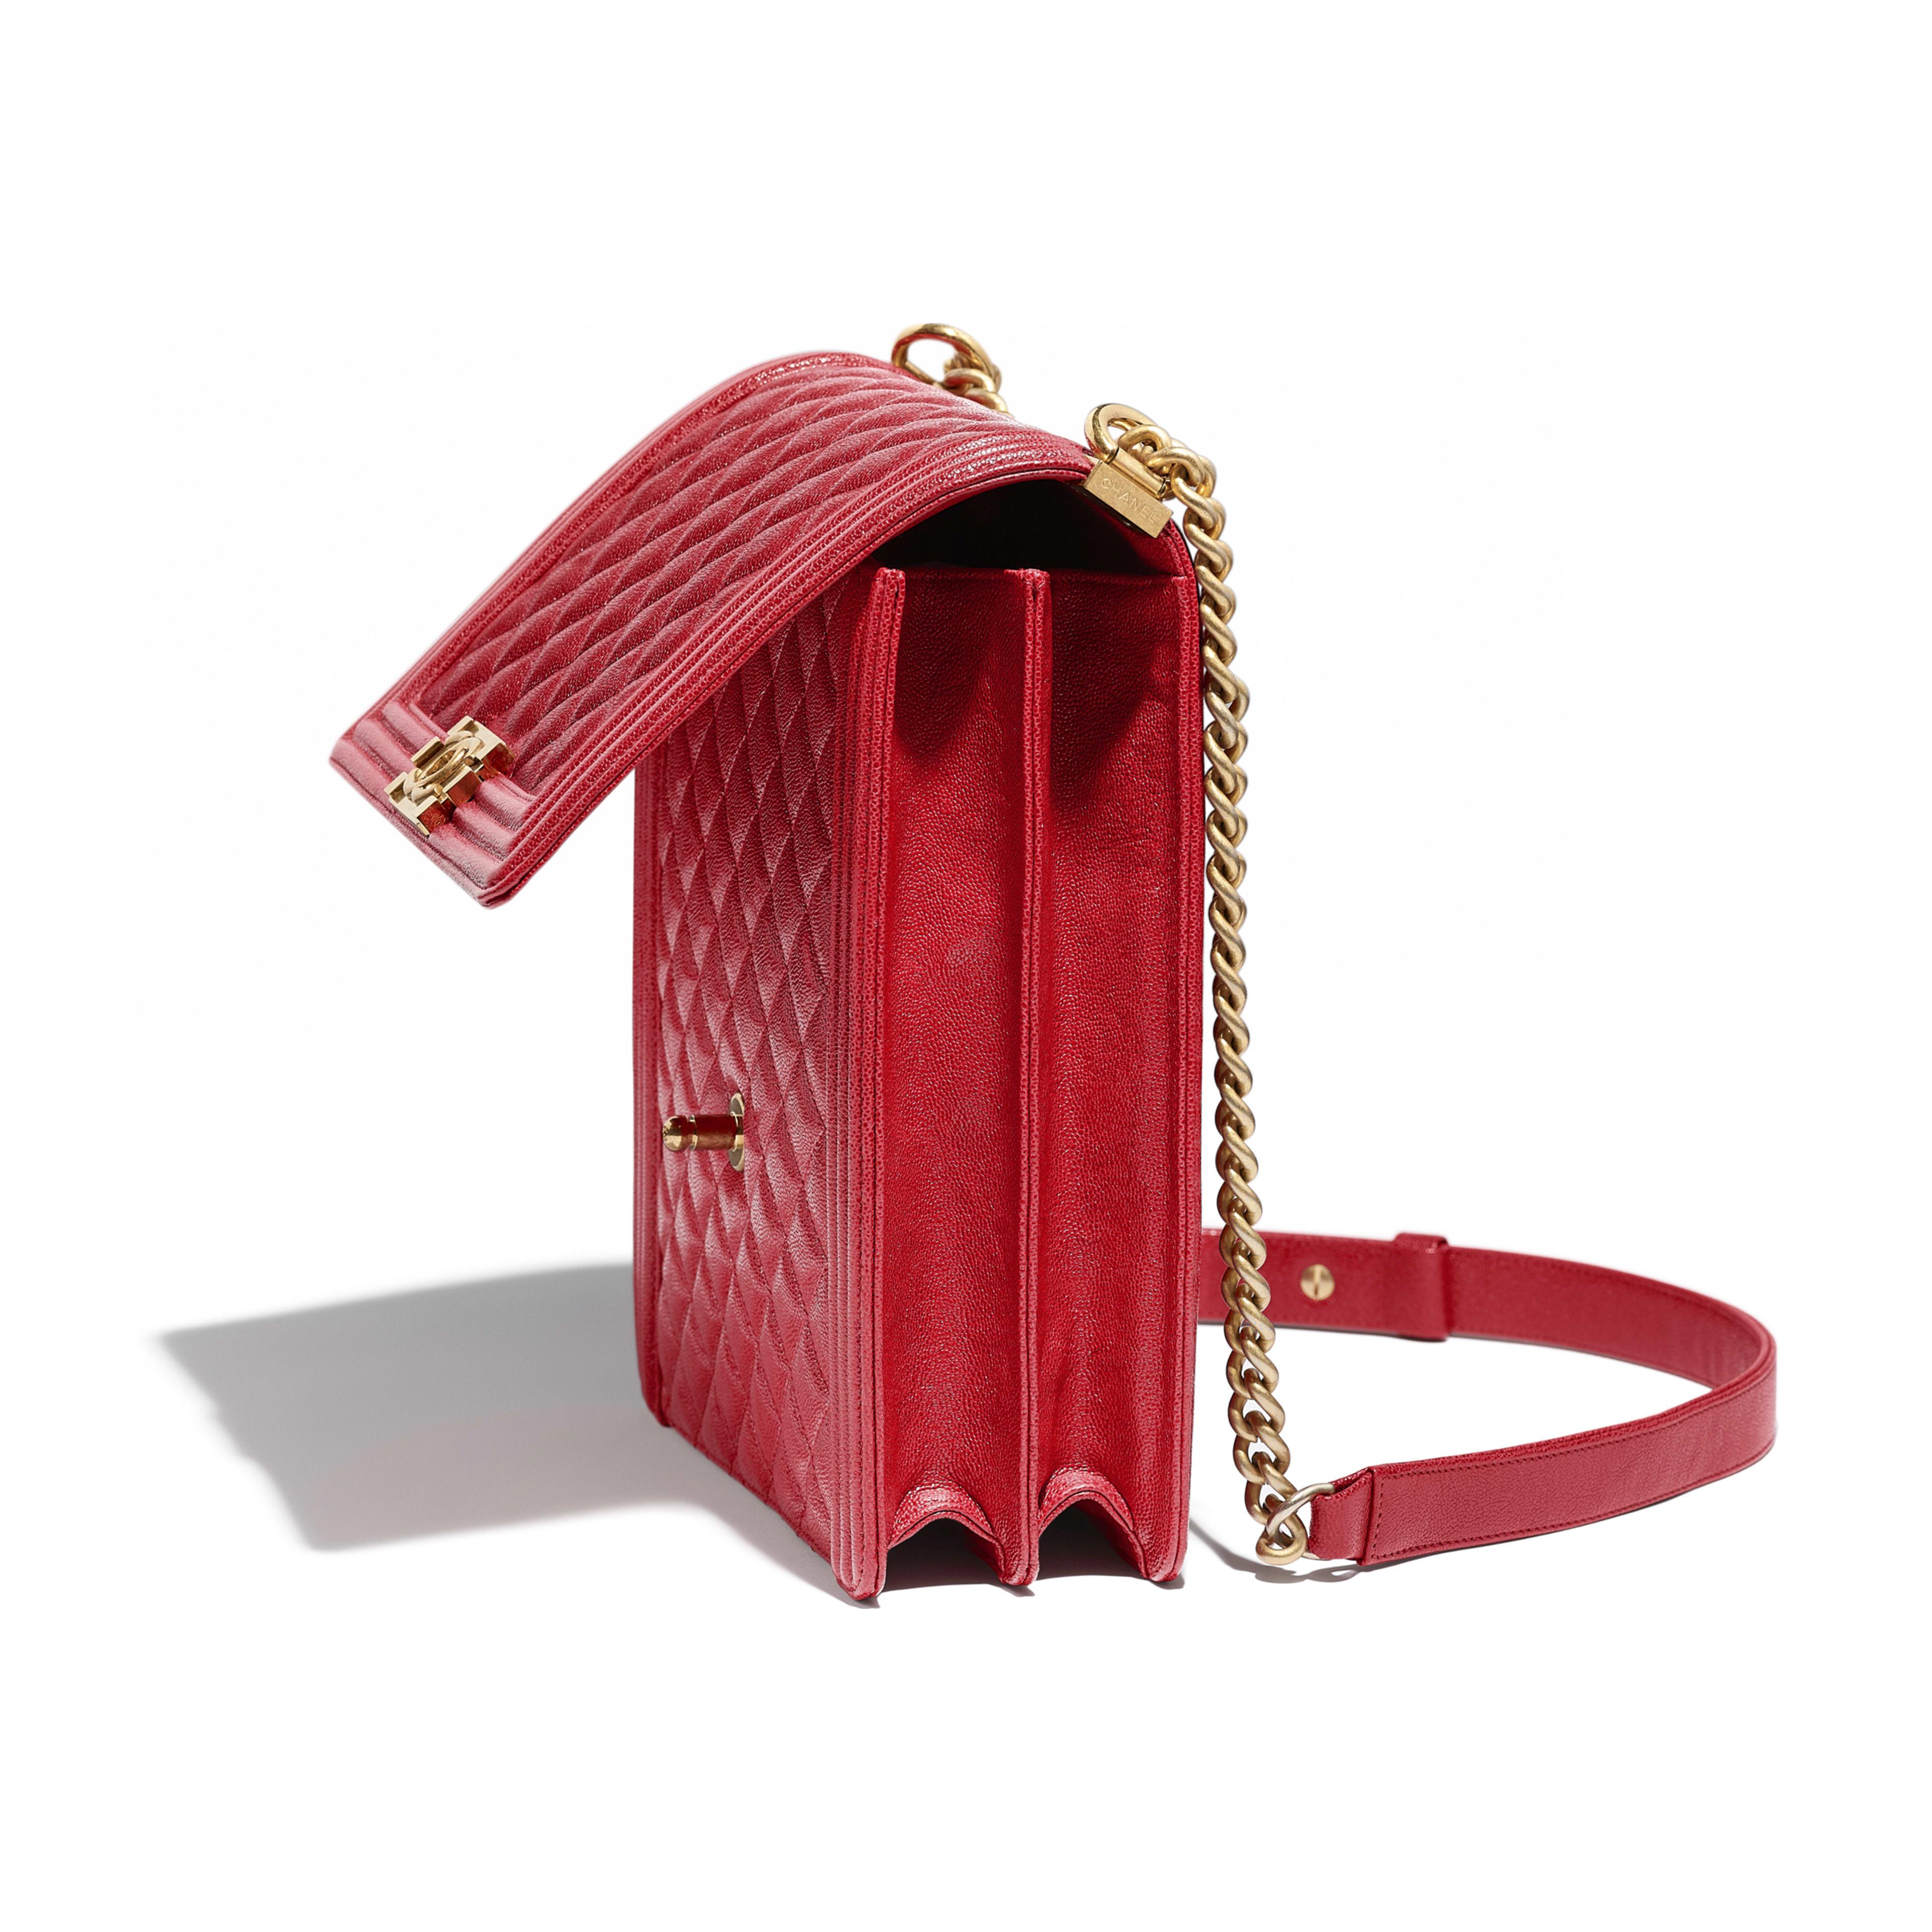 097576d5ac3db0 Grained Calfskin & Gold-Tone Metal Red Large BOY CHANEL Handbag | CHANEL